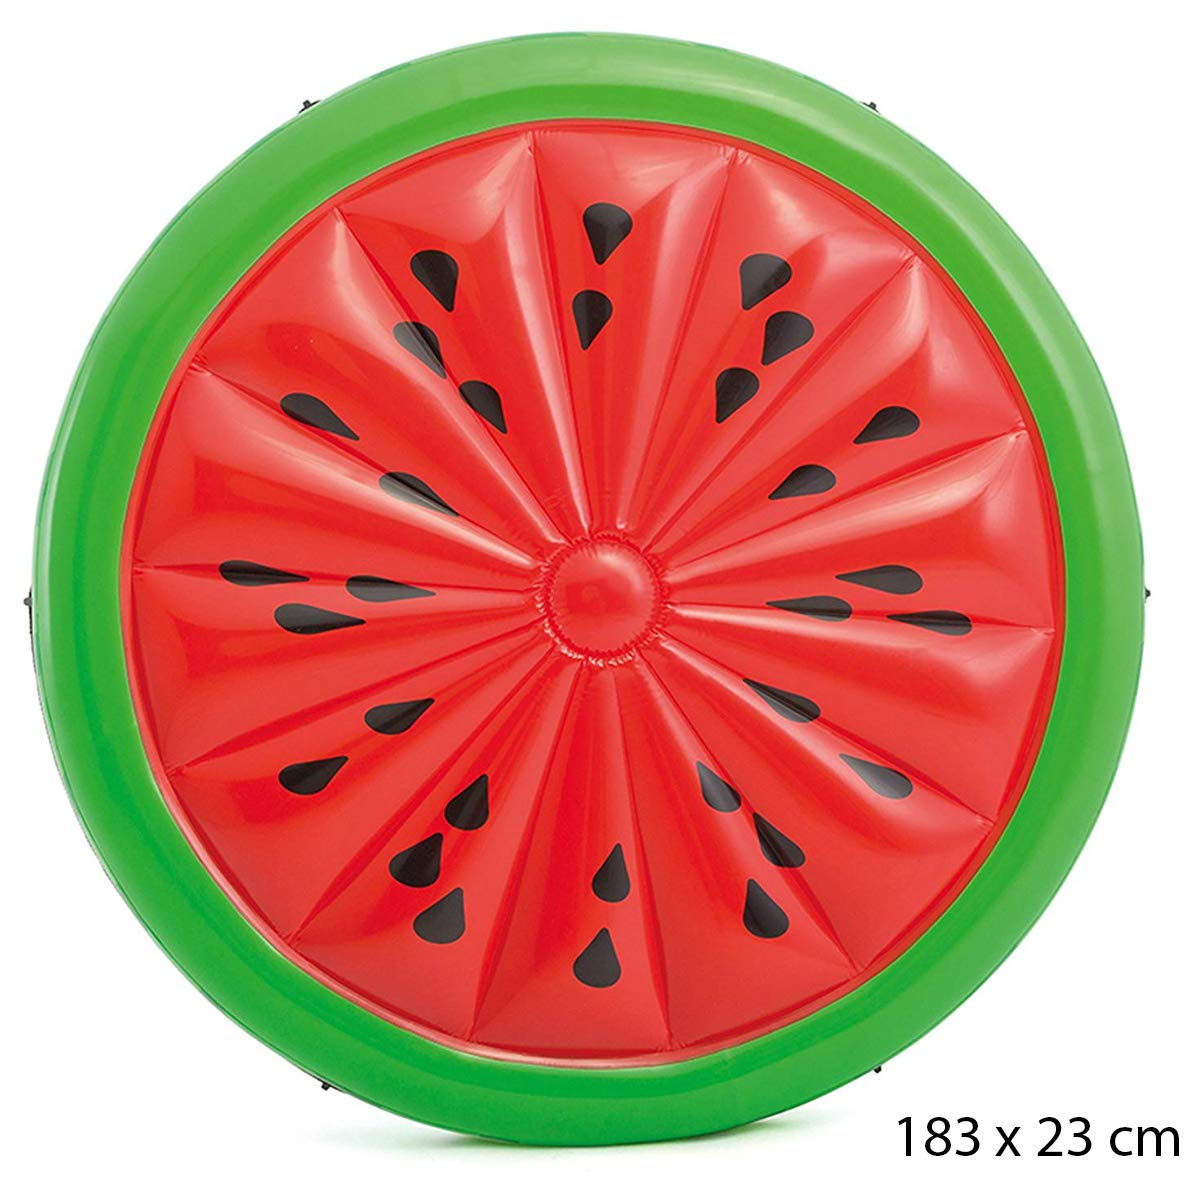 Cisne 2013, S.L. Colchoneta Sandía Hinchable diseño Rojo Adulto ...